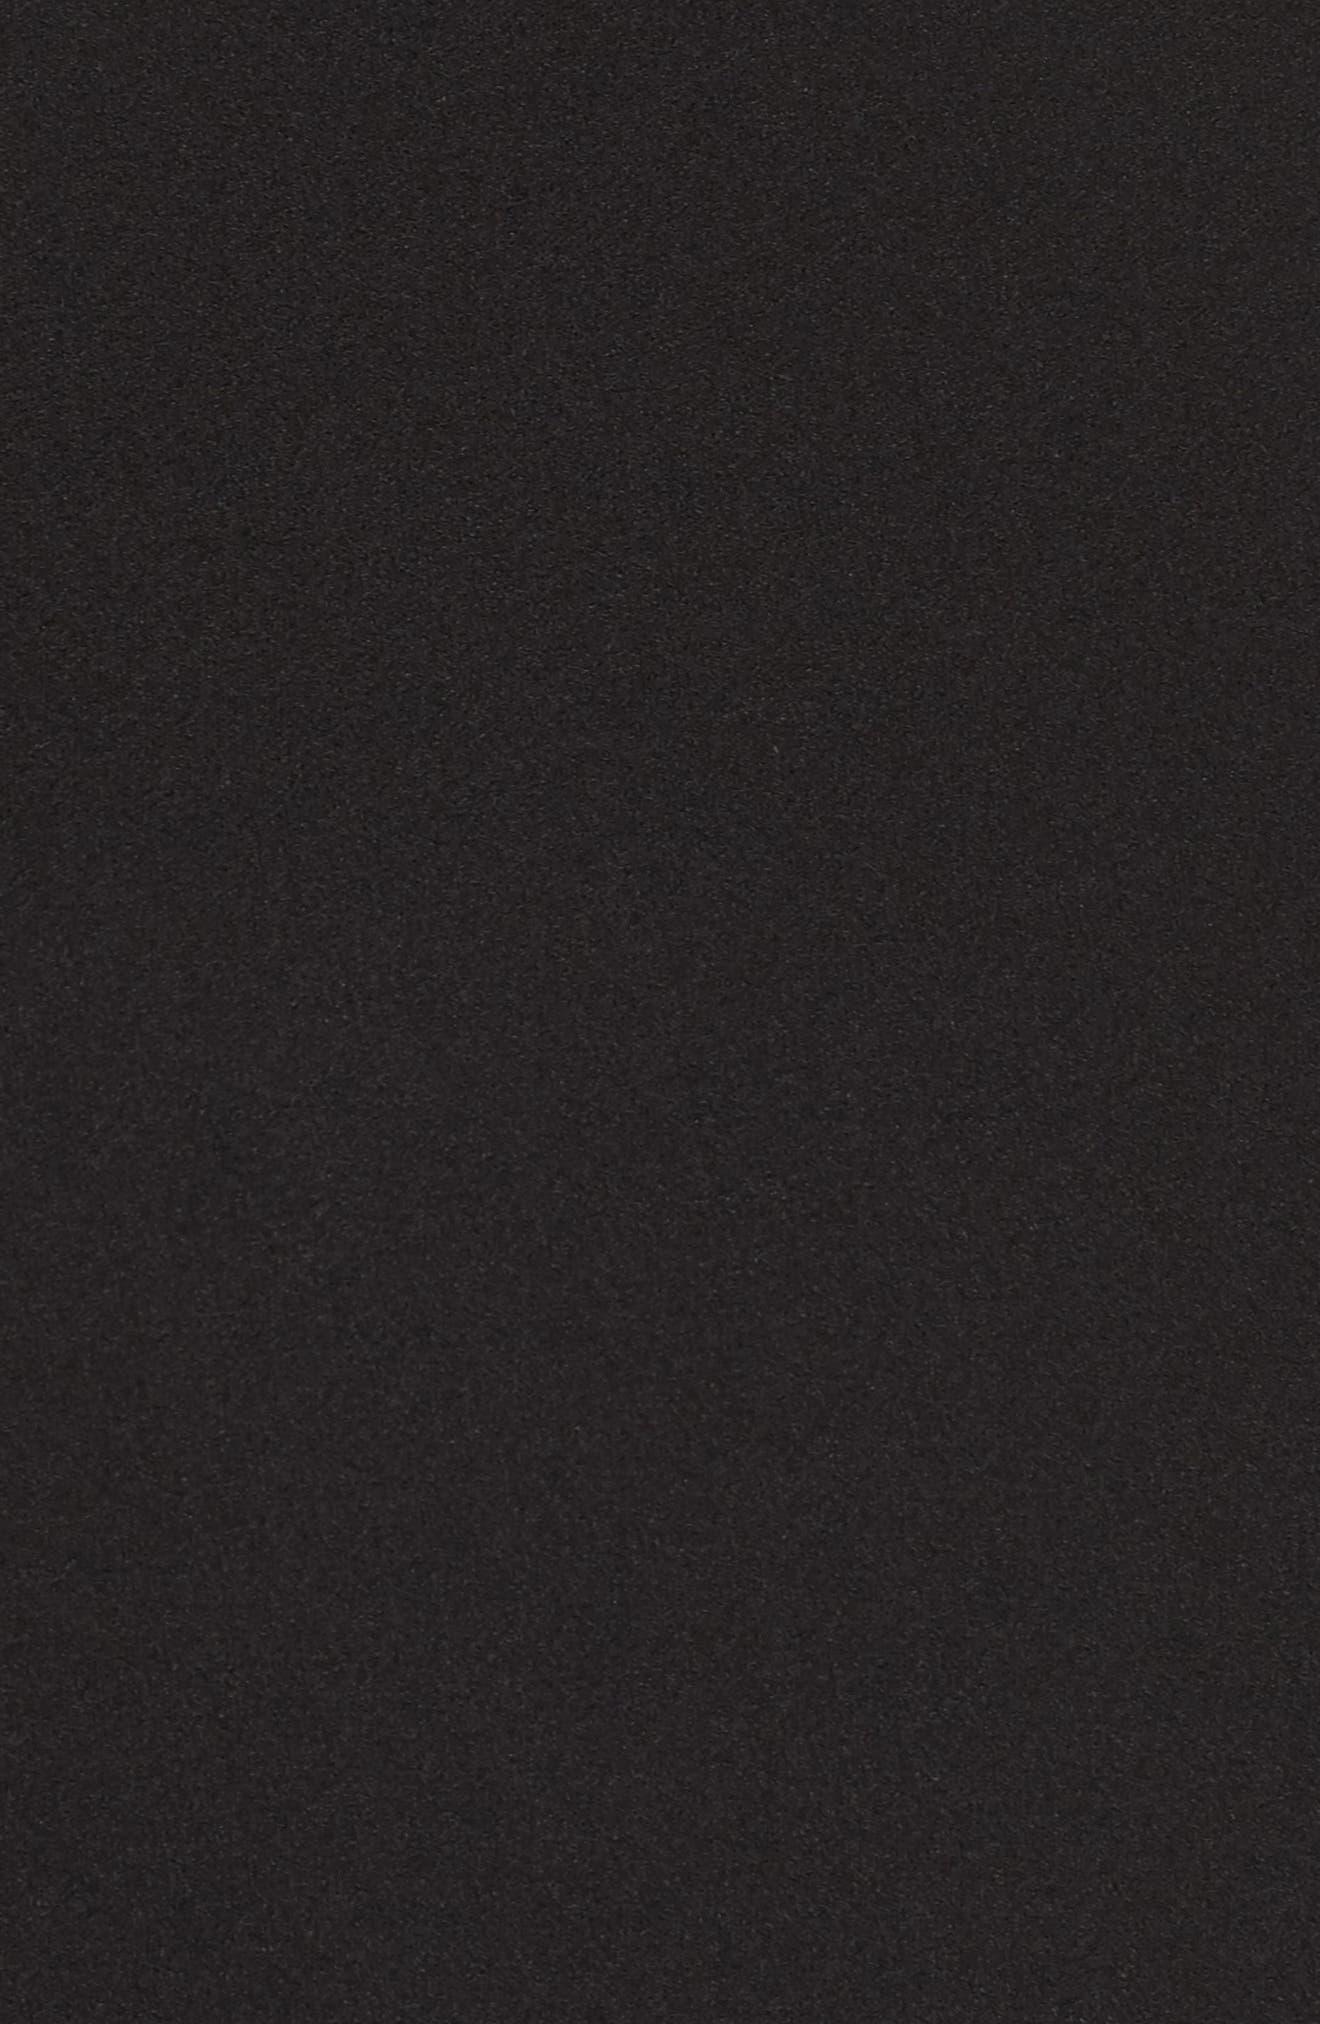 Split Sleeve Shift Dress,                             Alternate thumbnail 5, color,                             Black